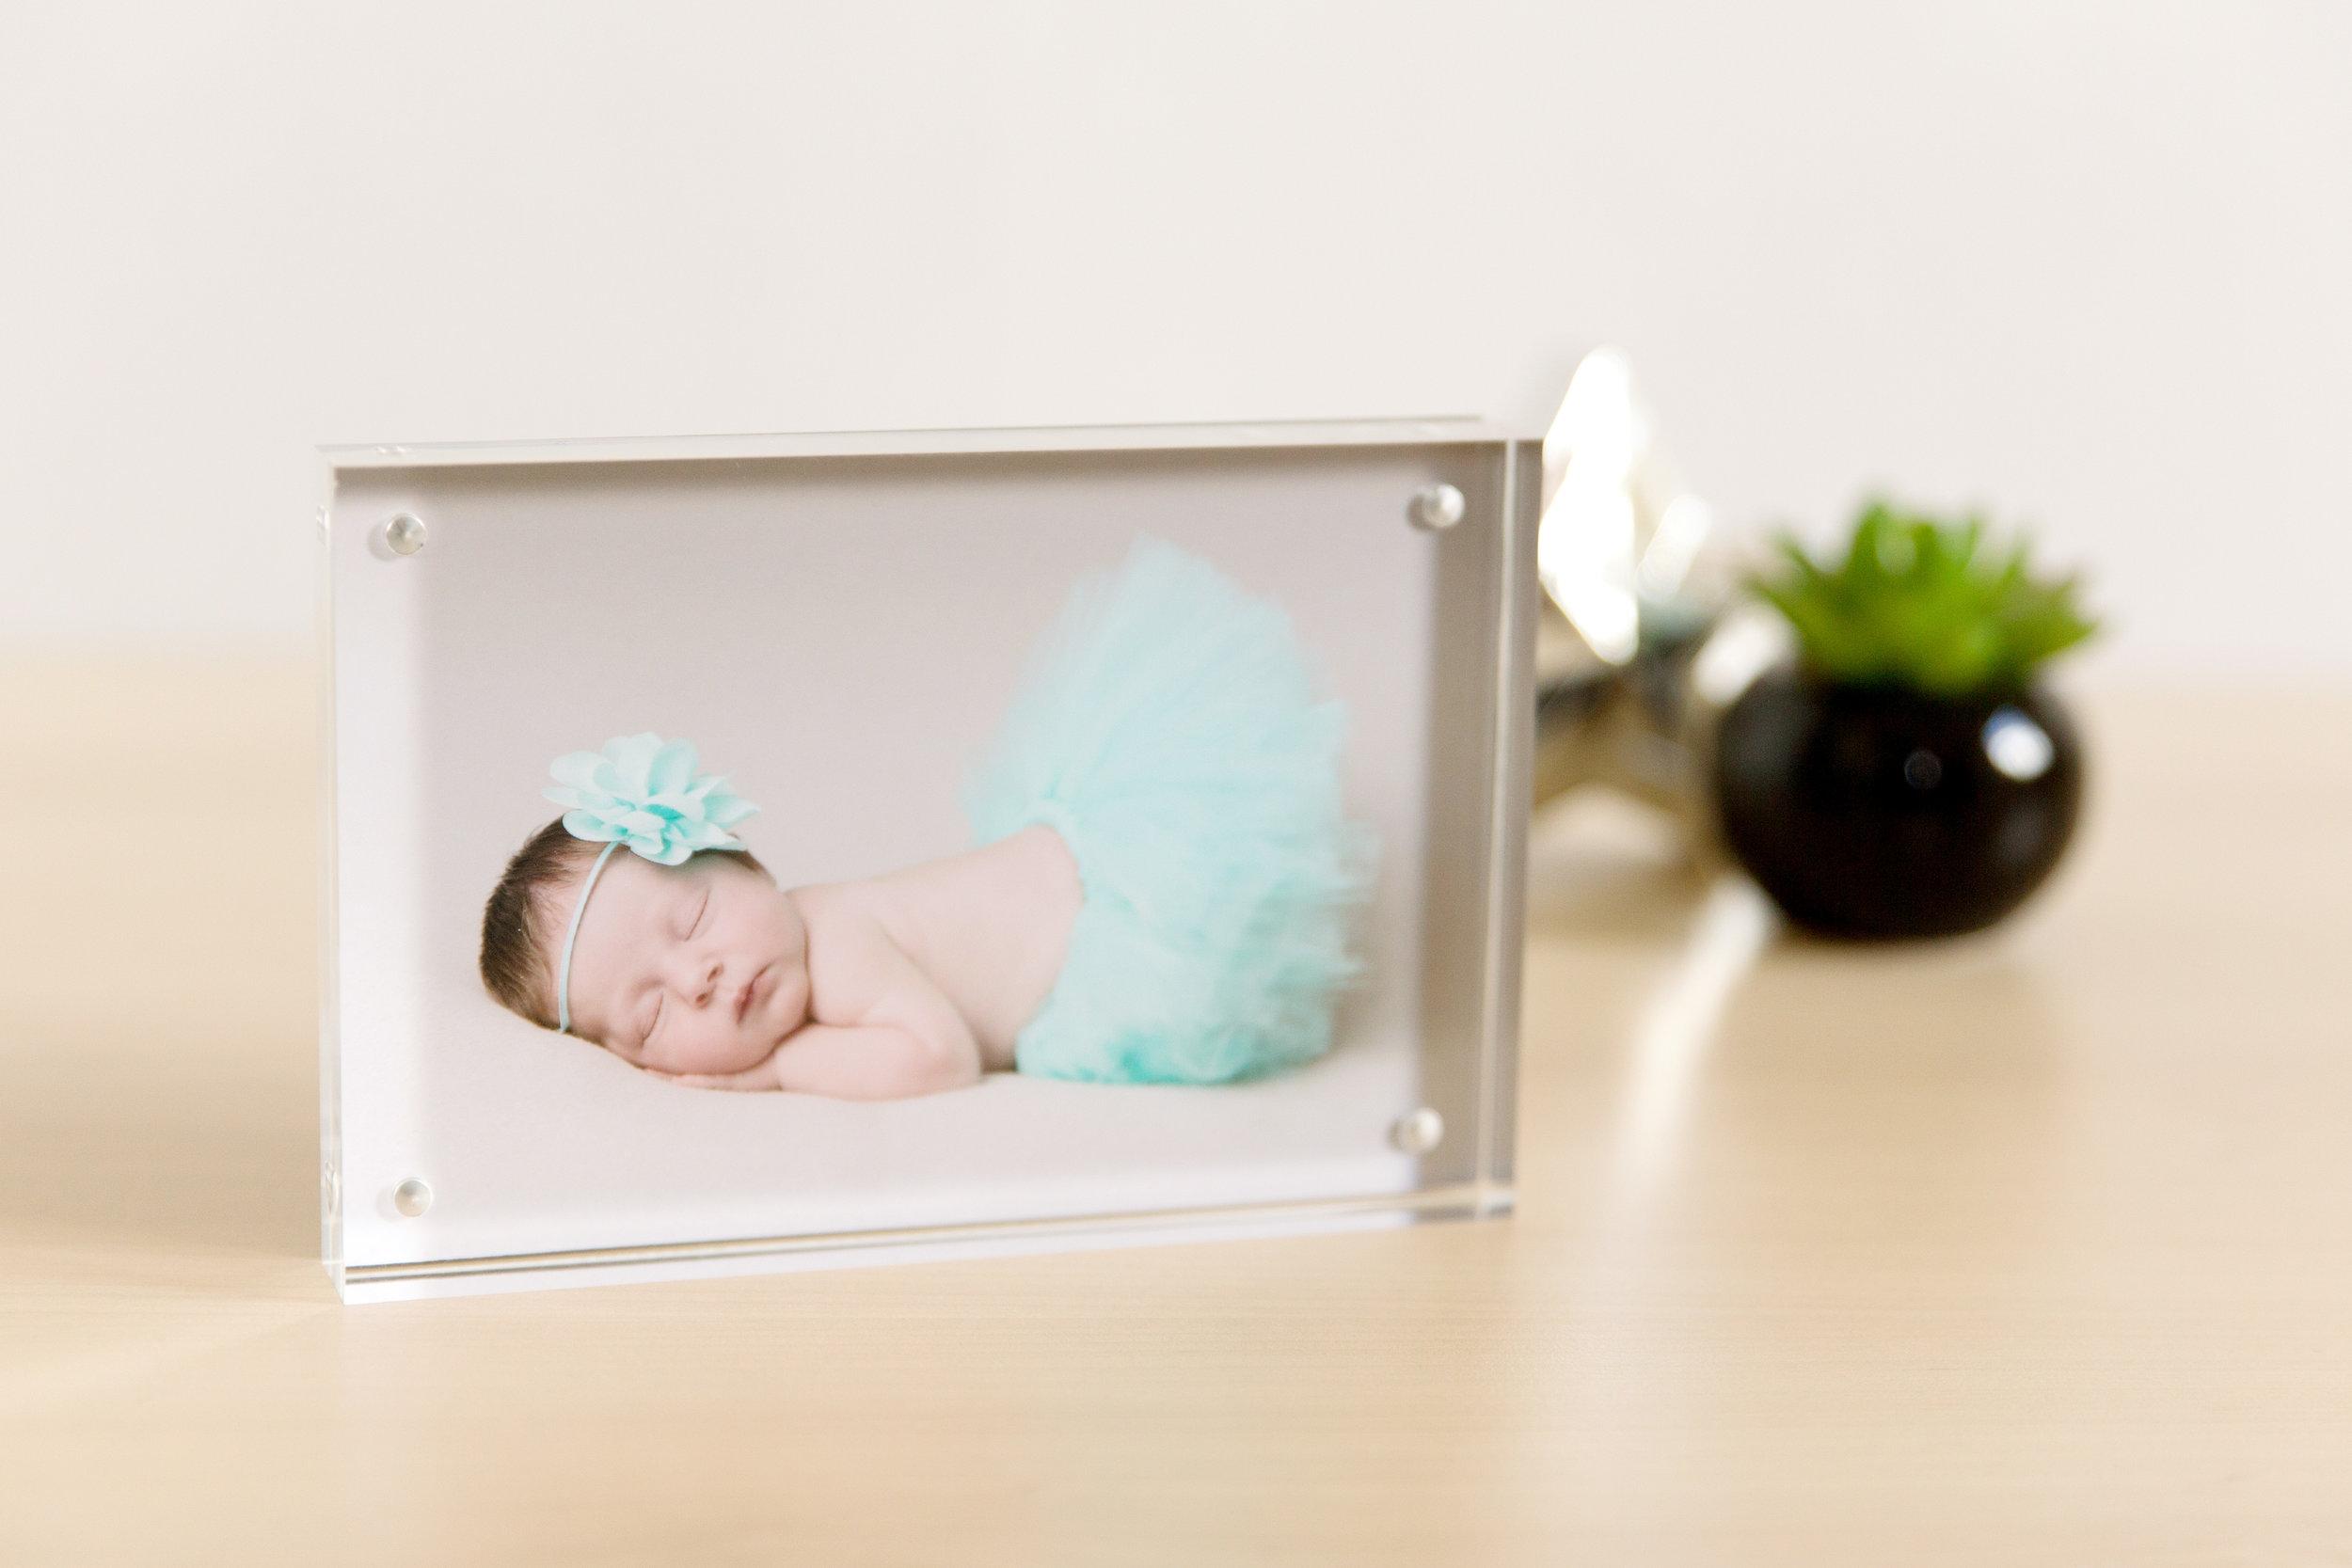 newborn-baby-photography-hemel-hempstead-acrylic-block-madison.jpg